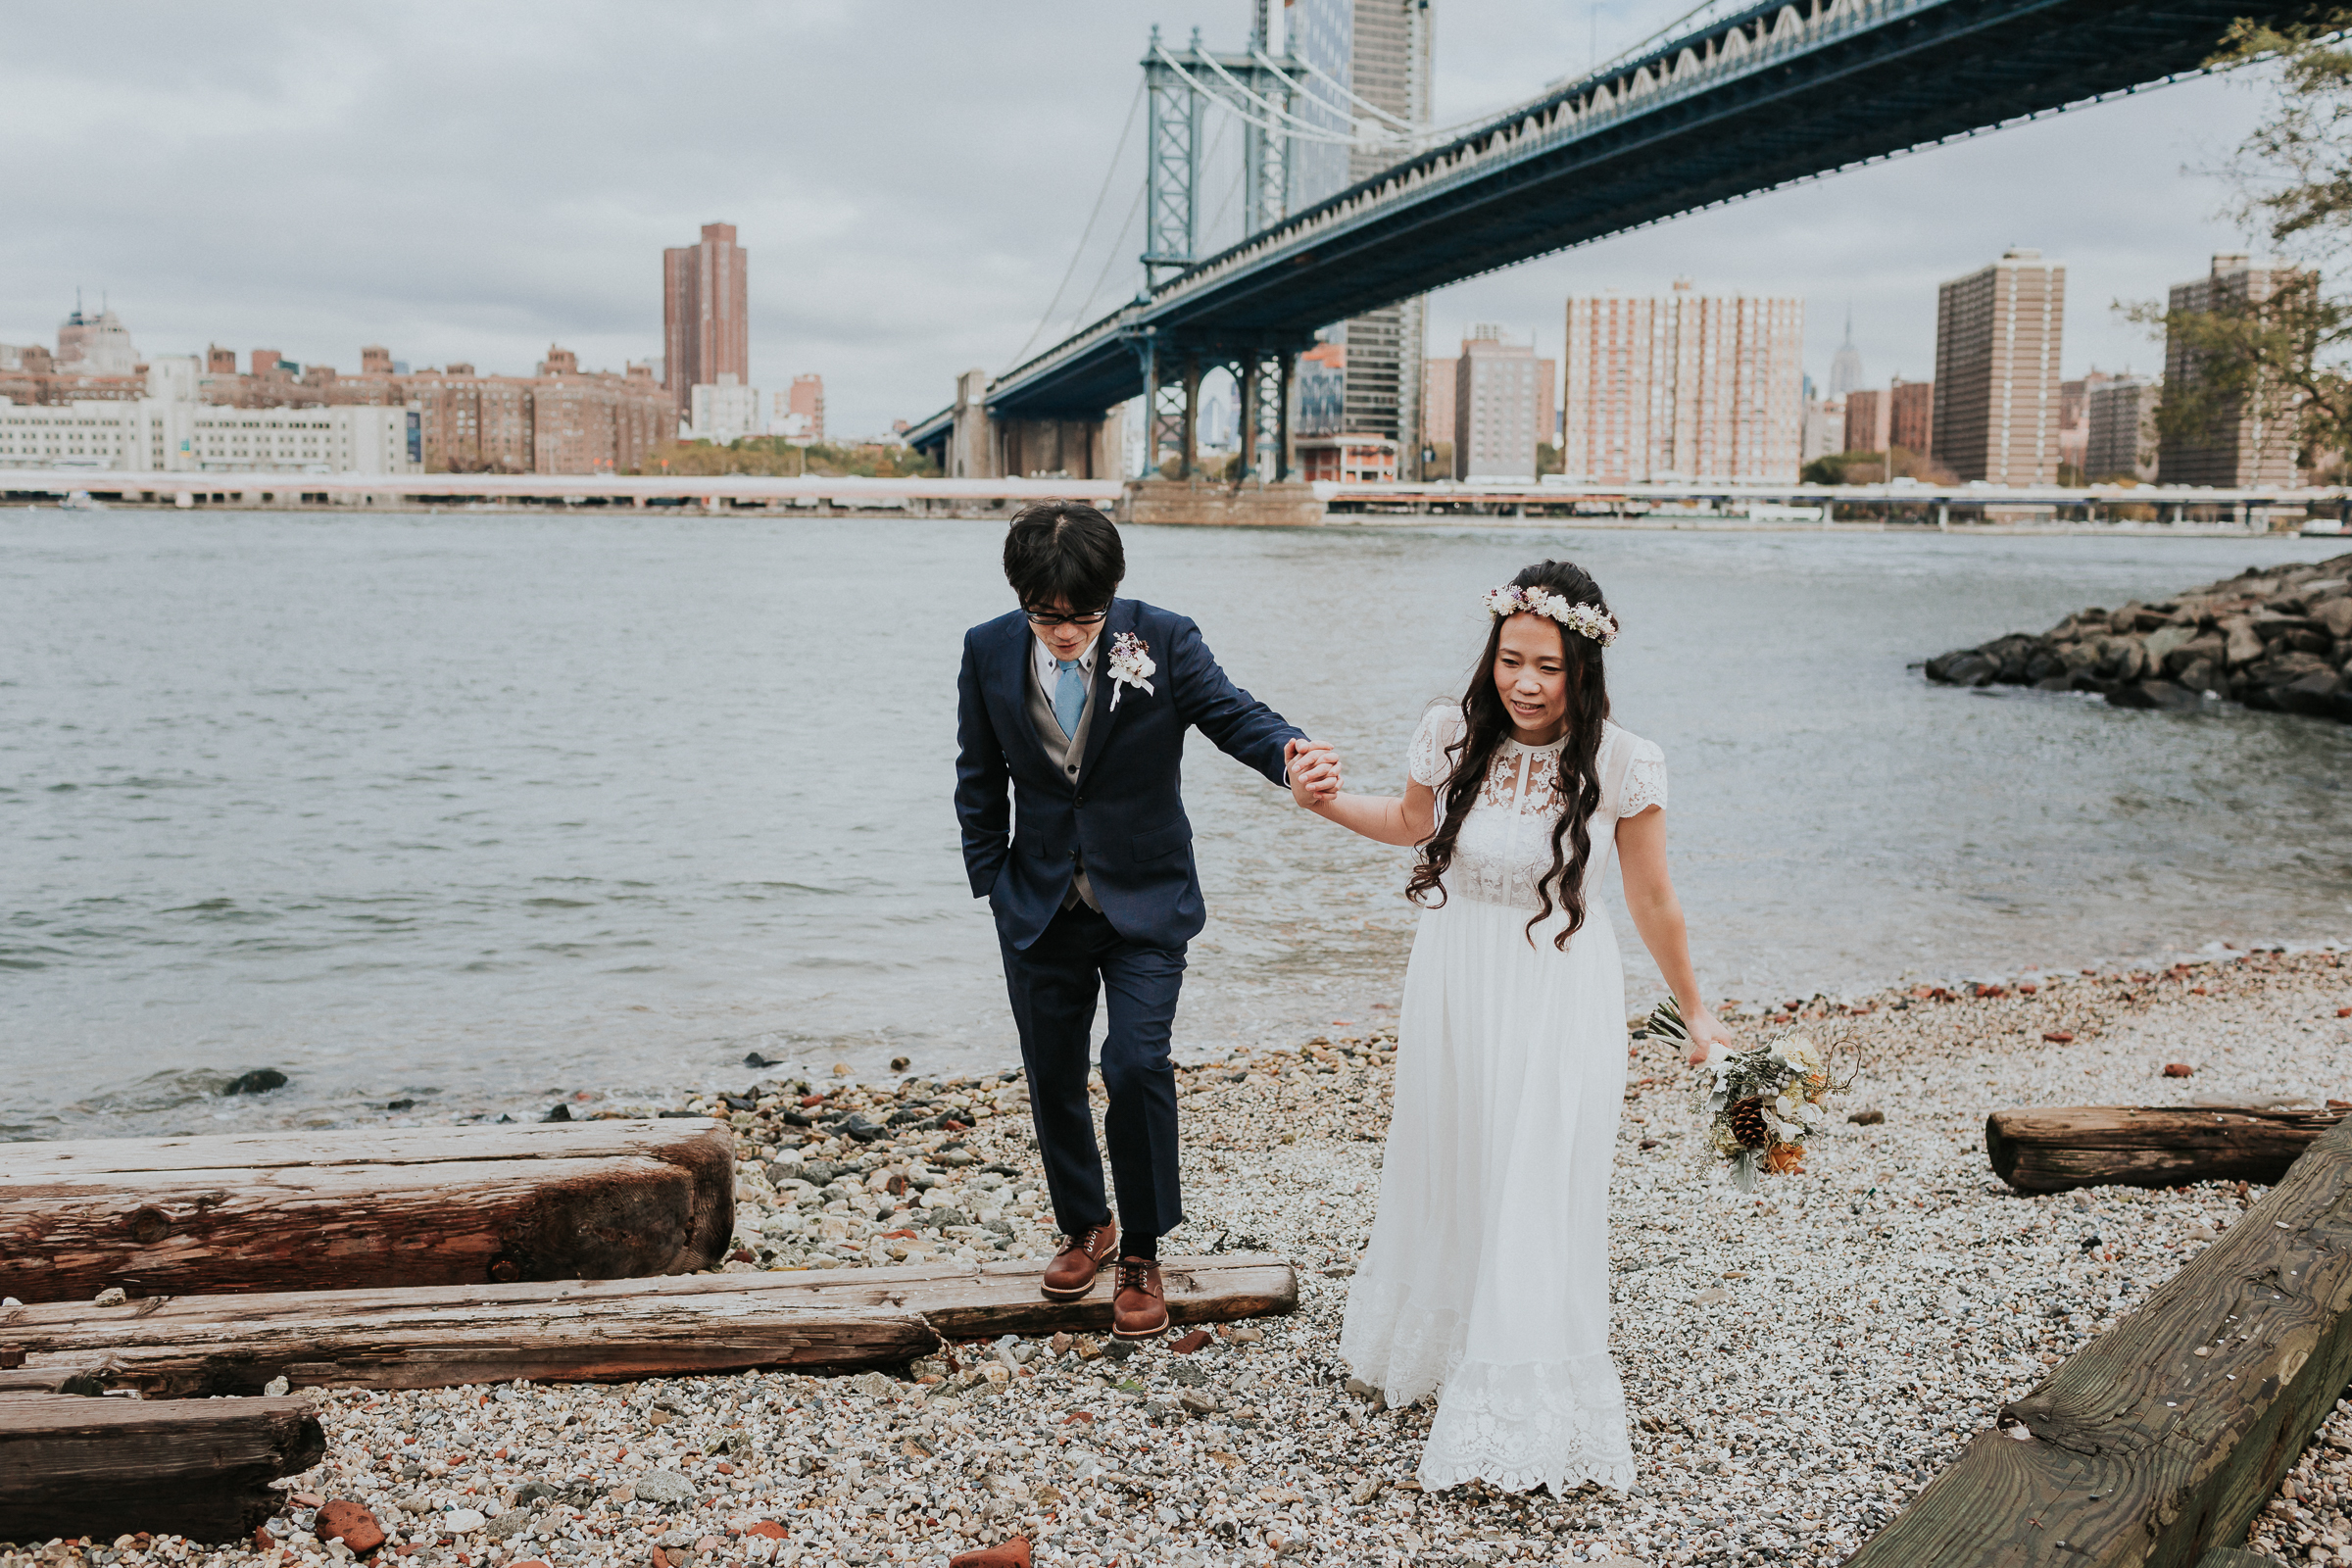 Central-Park-Brooklyn-Bridge-Dumbo-NYC-Documentary-Wedding-Photographer-9.jpg